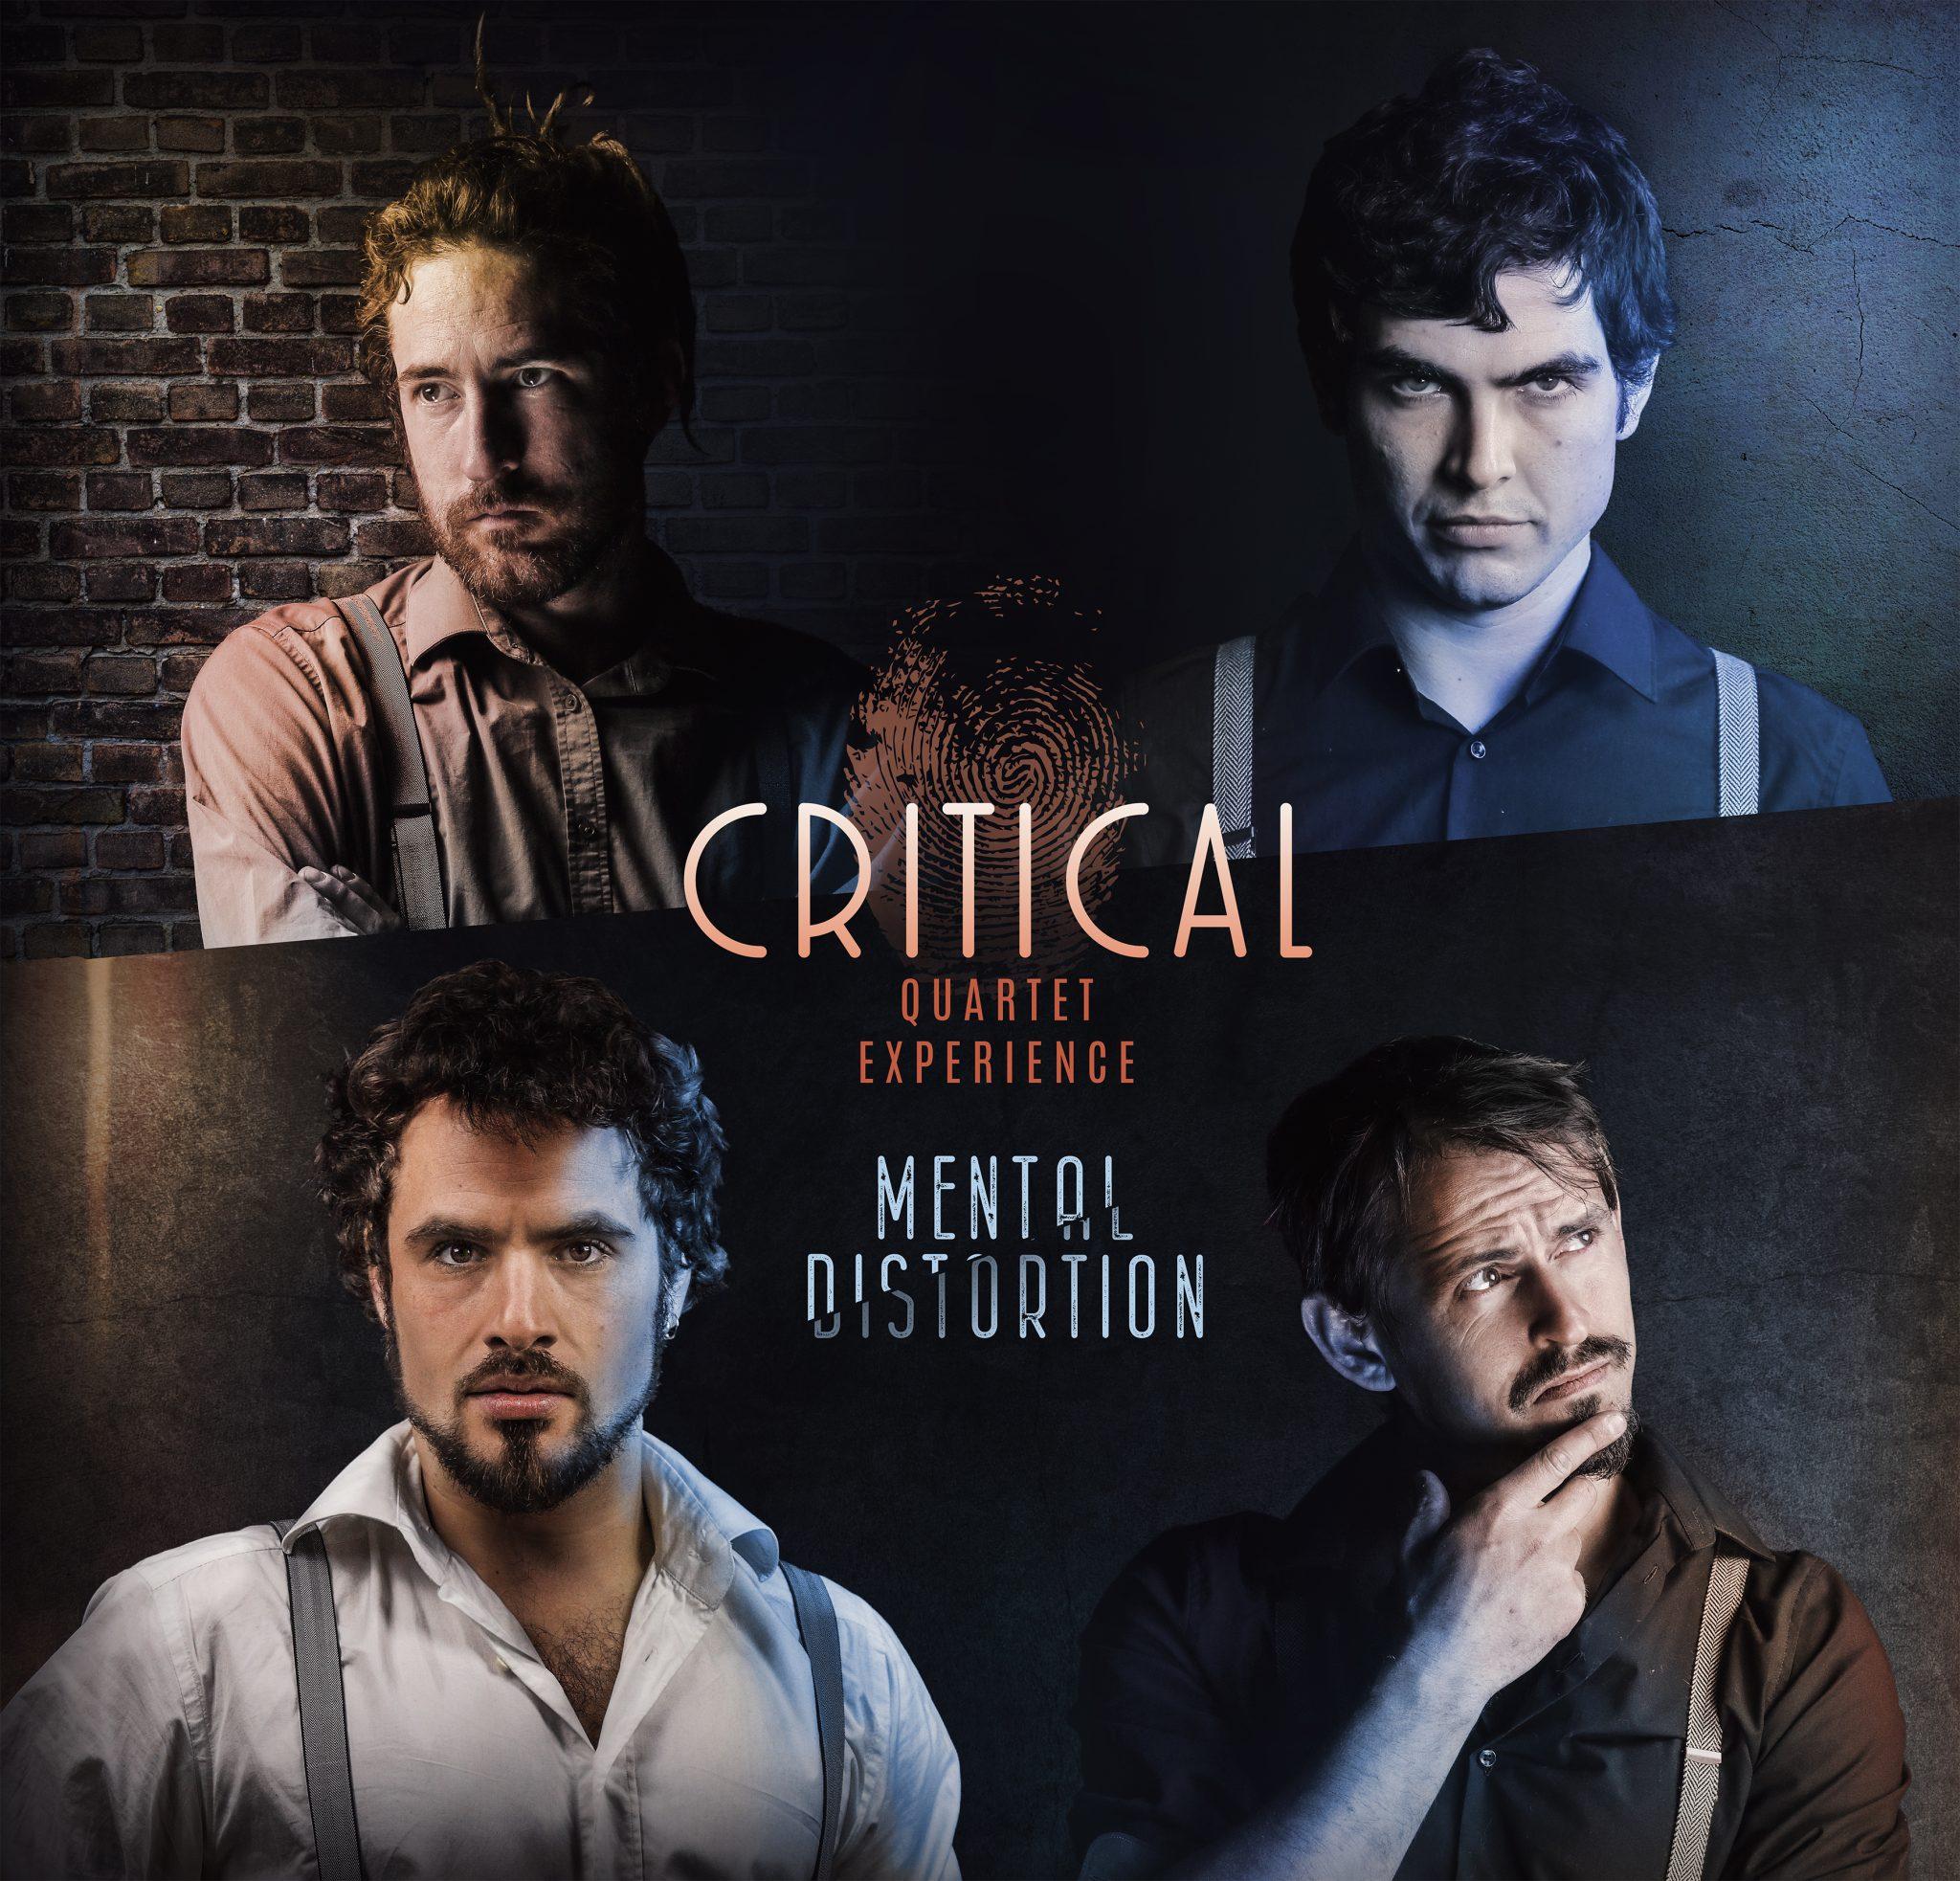 Critical Quartet Experience Mental Distortion